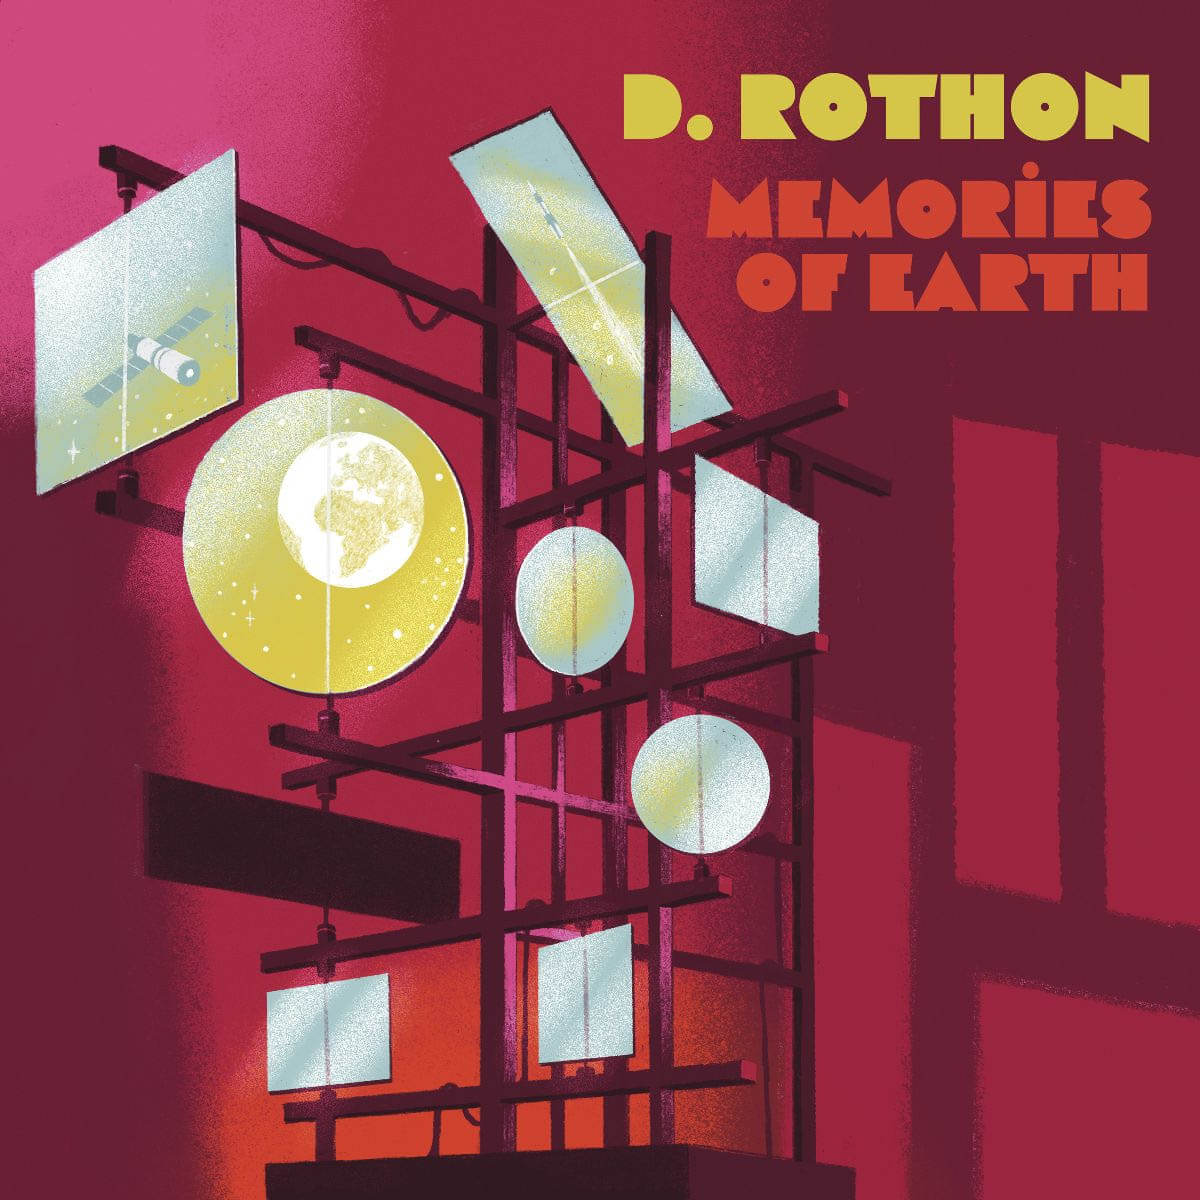 d rothon memories of earth CD